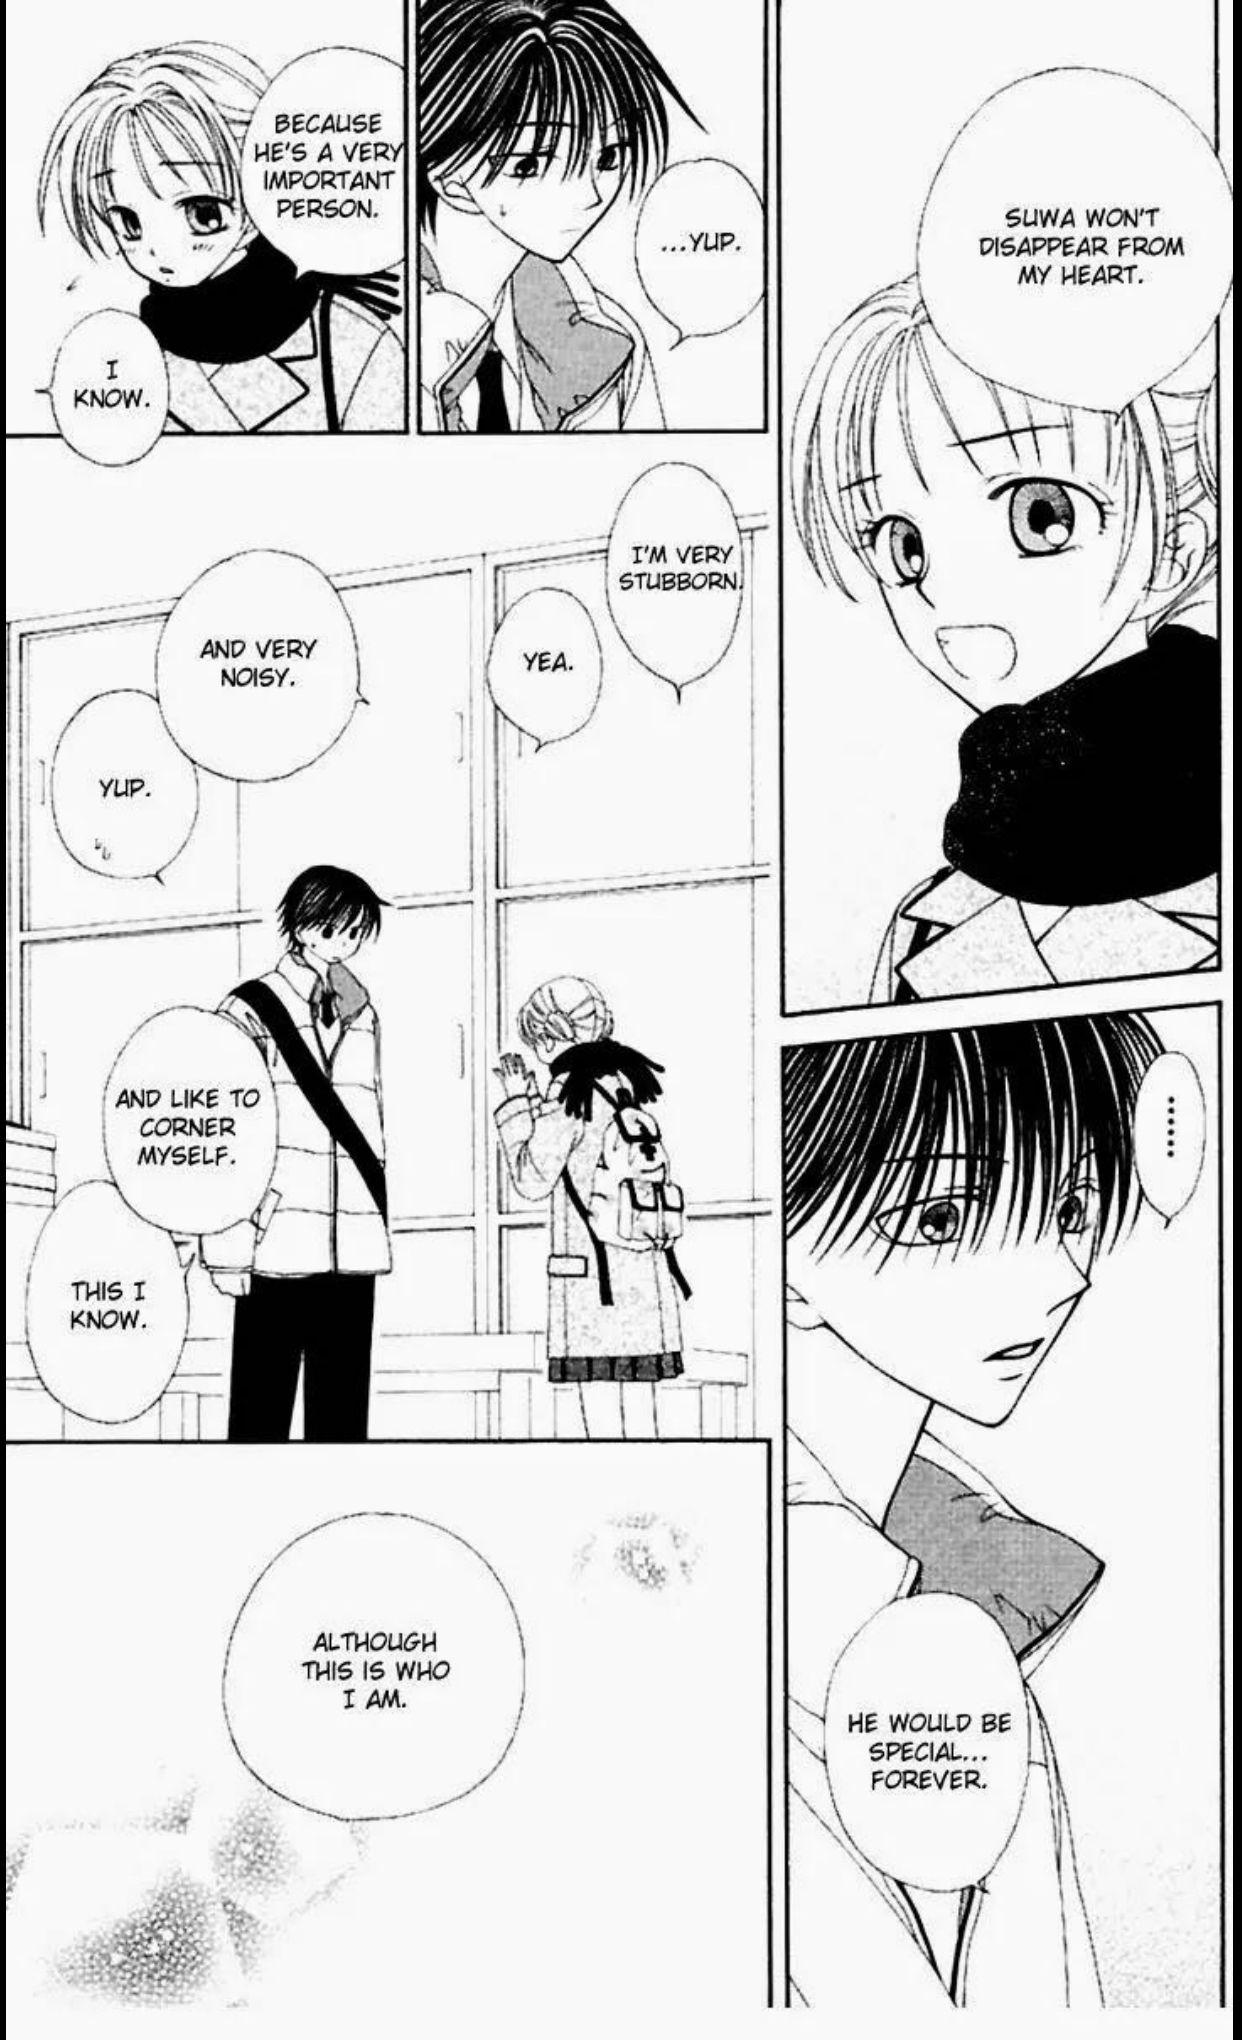 Pin by Animemangaluver on Hitsuji no Namida Manga (Kanzaki